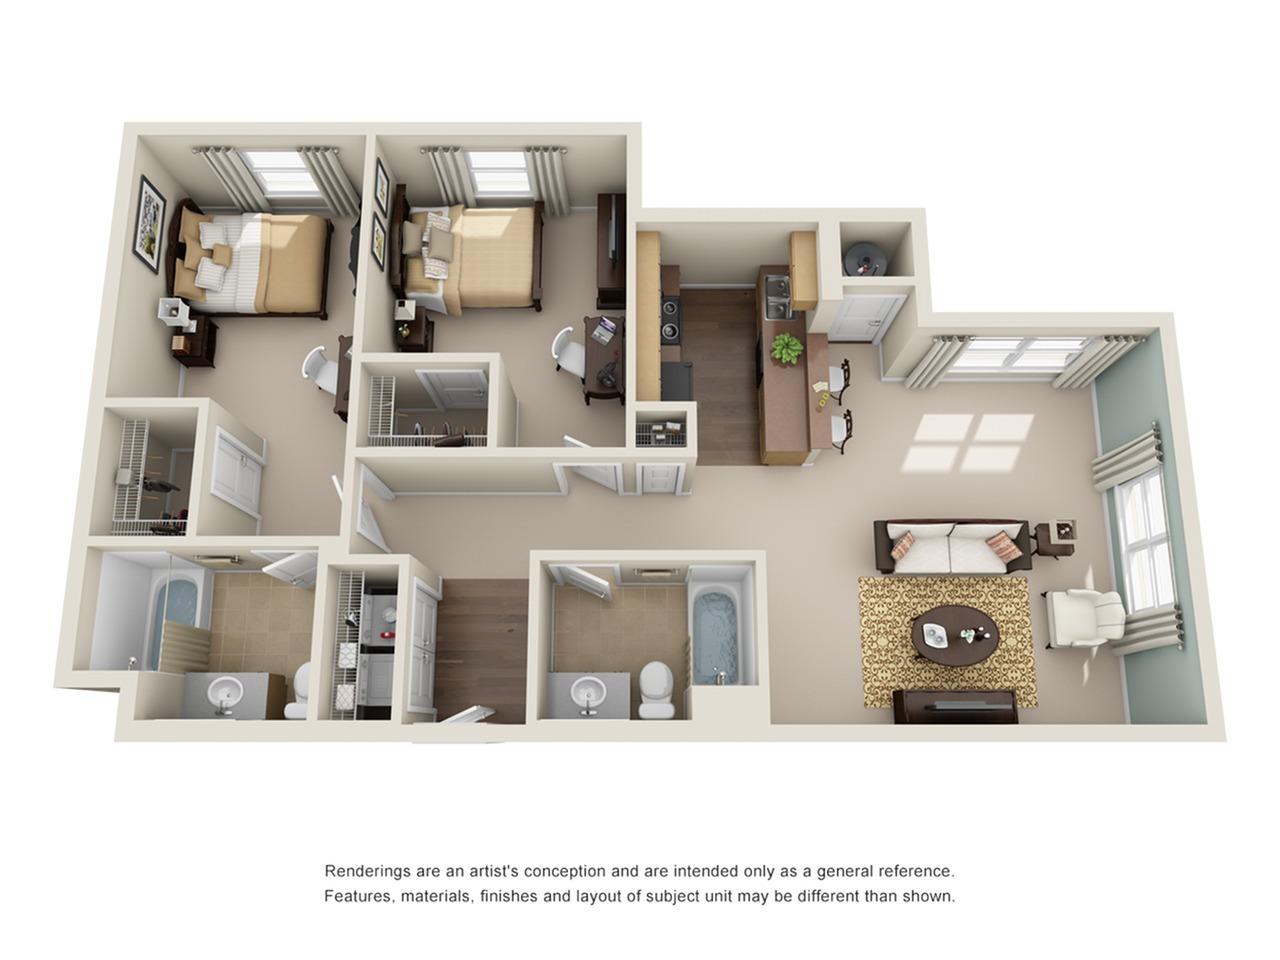 2 bedroom apartment in atlanta ga